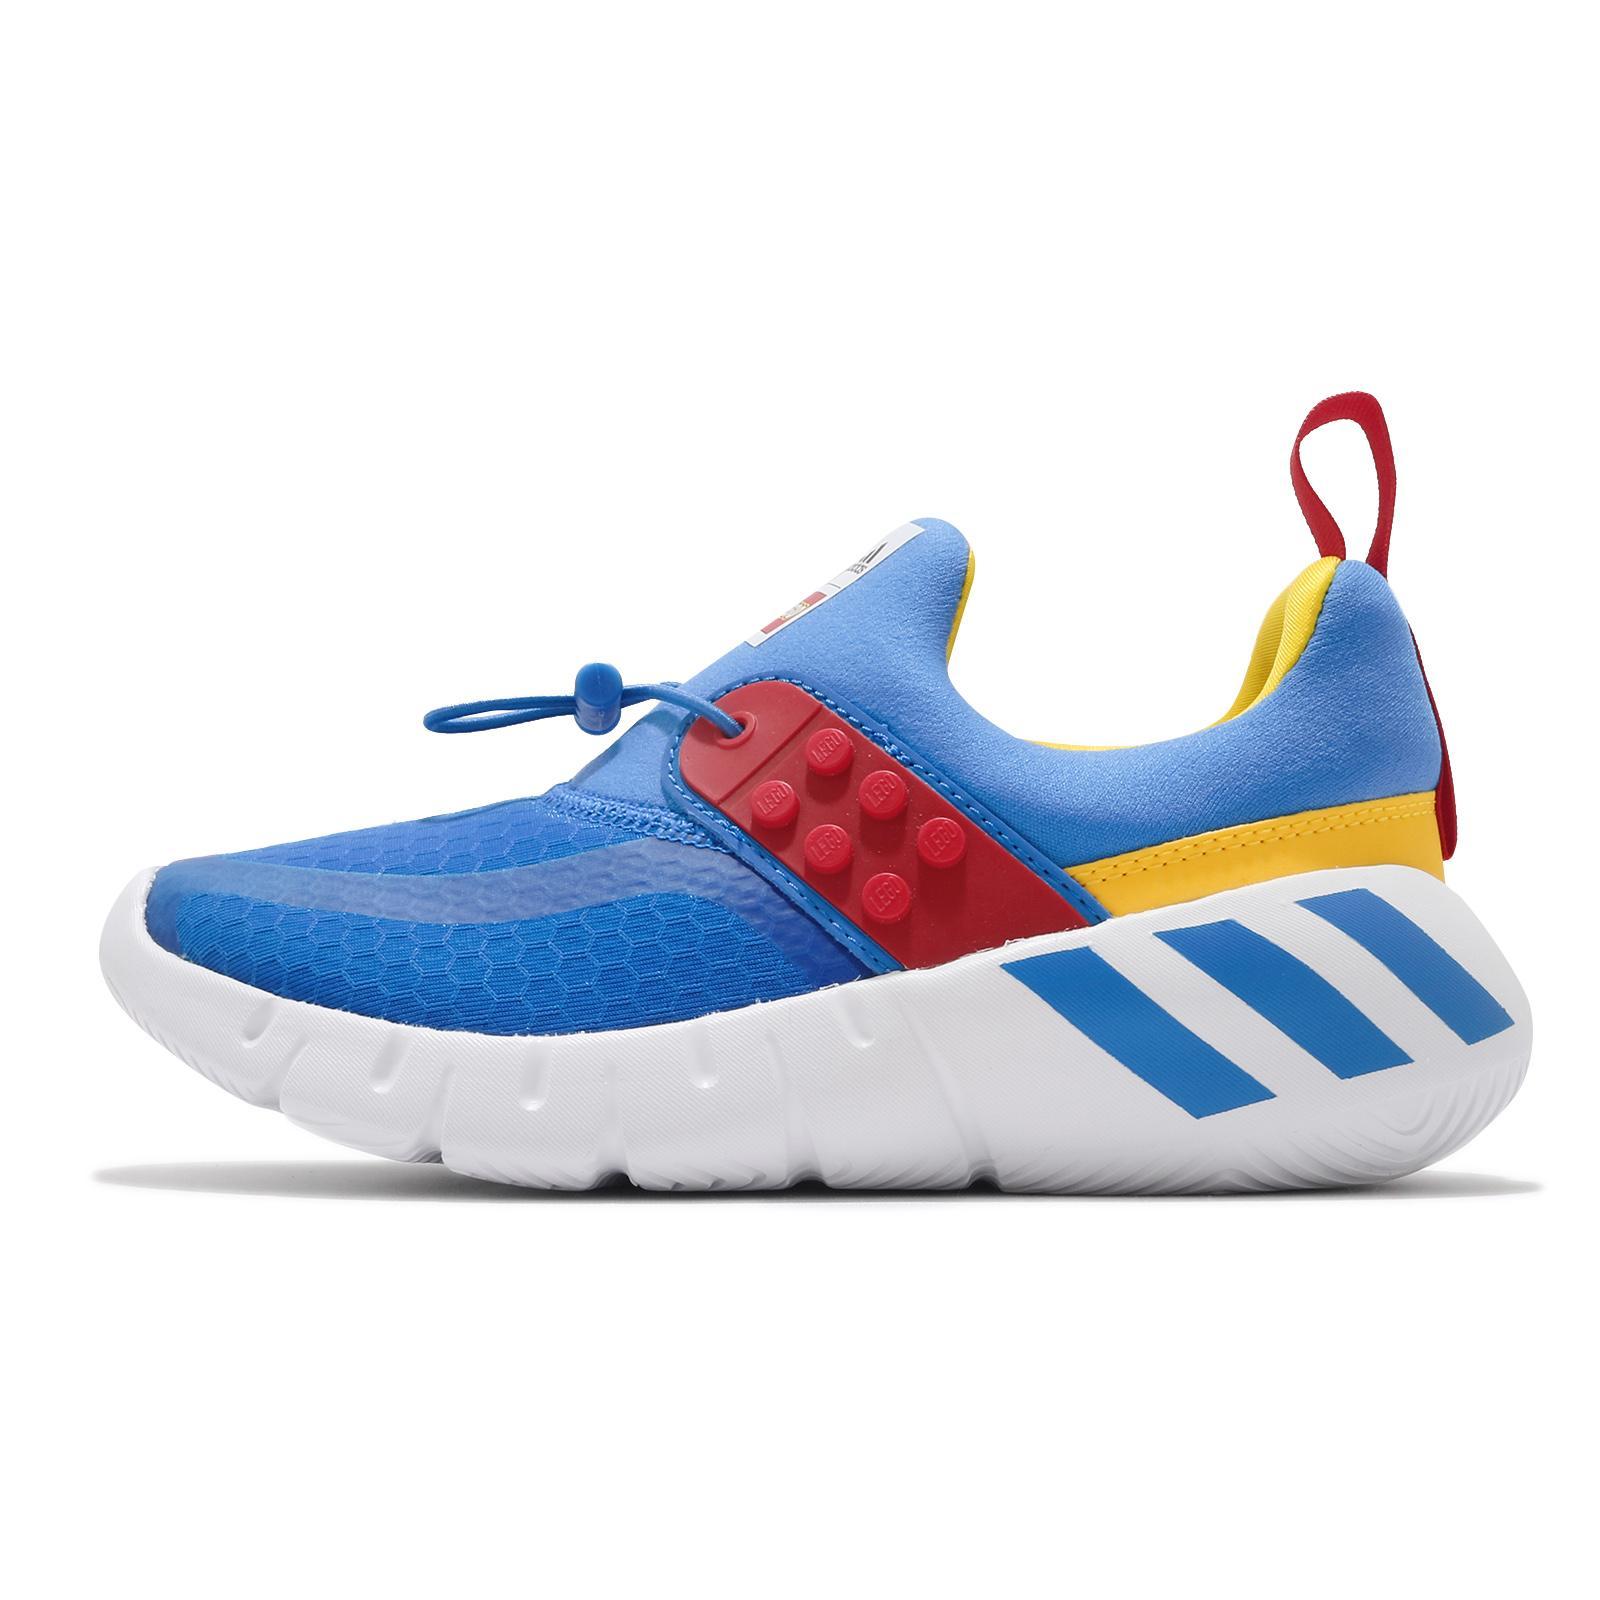 adidas Rapidazen Lego C Blue Red Yellow Kids Preschool Cross ...